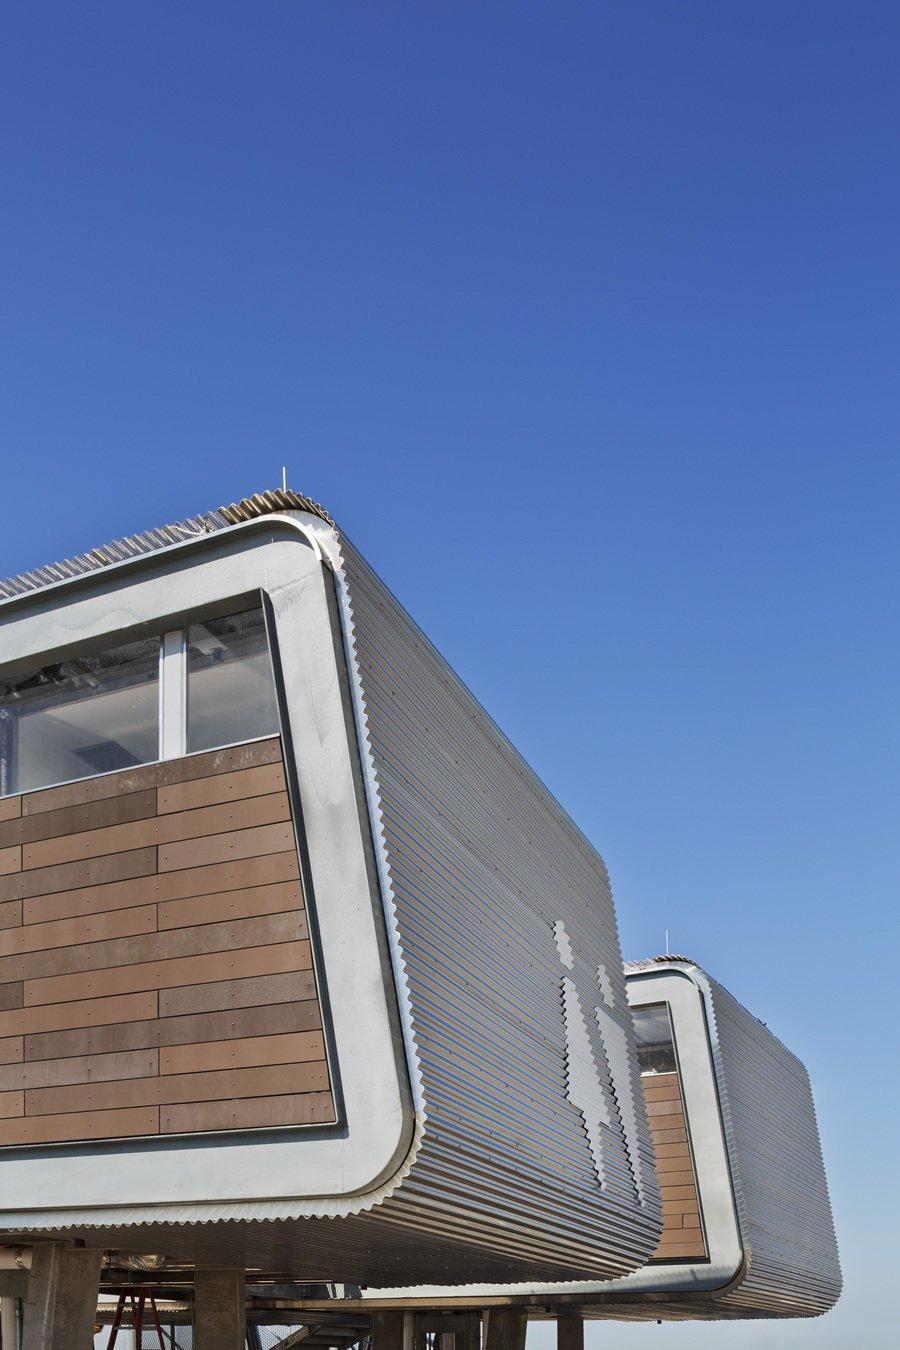 #exterior #outside #outdoor #landscape #view #industrial #publicworks #modular #sustainable #green #ecofriendly #NewYorkCity #NewYork #GarrisonArchitects  NYC Parks Beach Restoration Modules